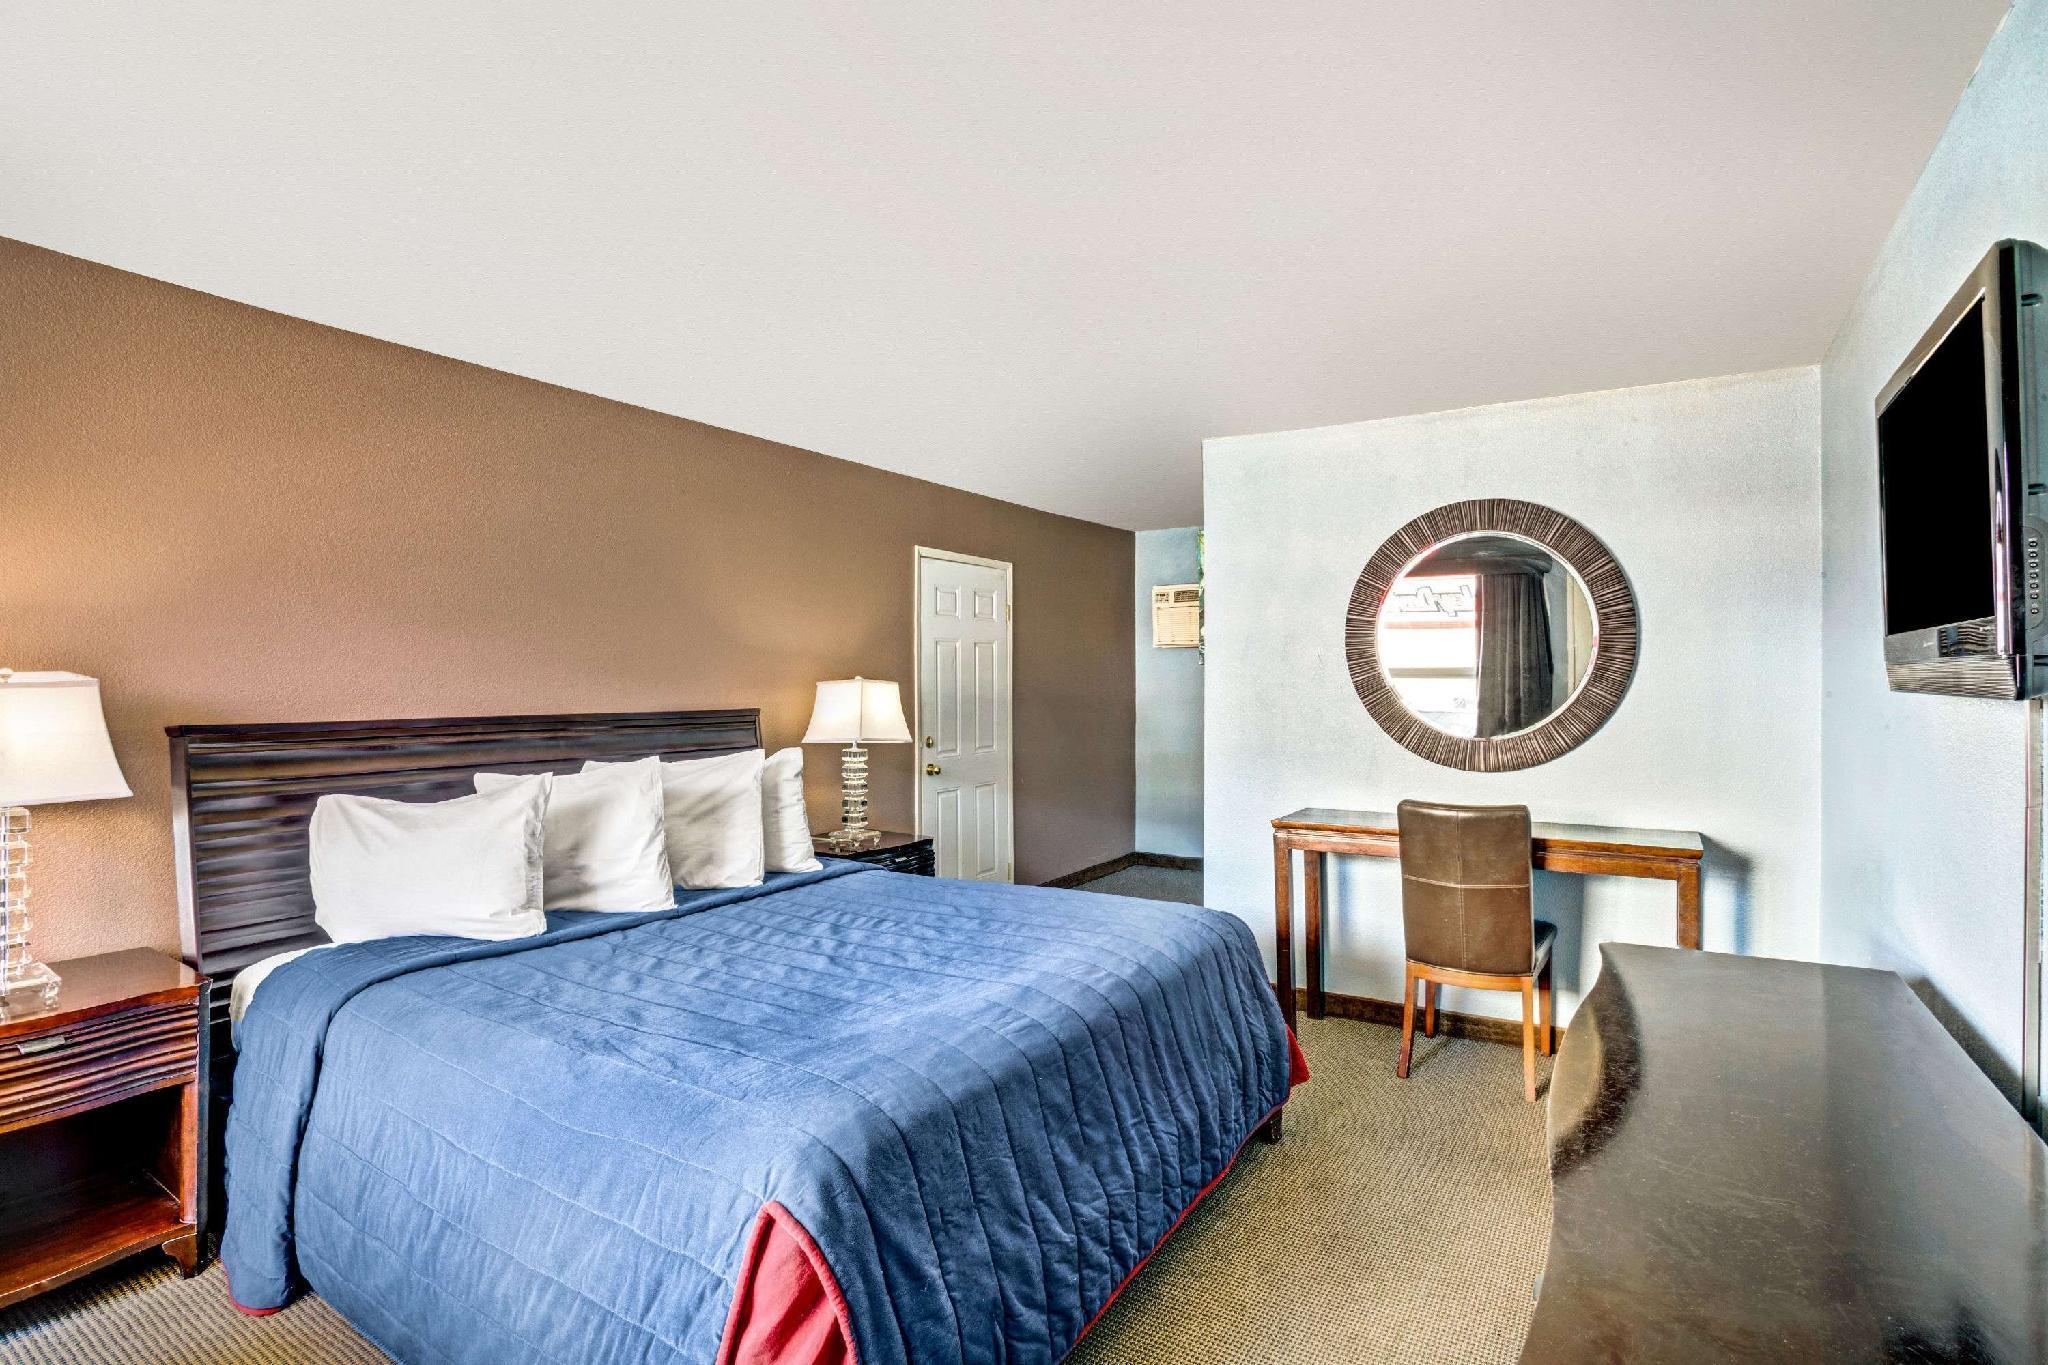 nude-cheap-rooms-las-vegas-strip-christopher-meloni-indian